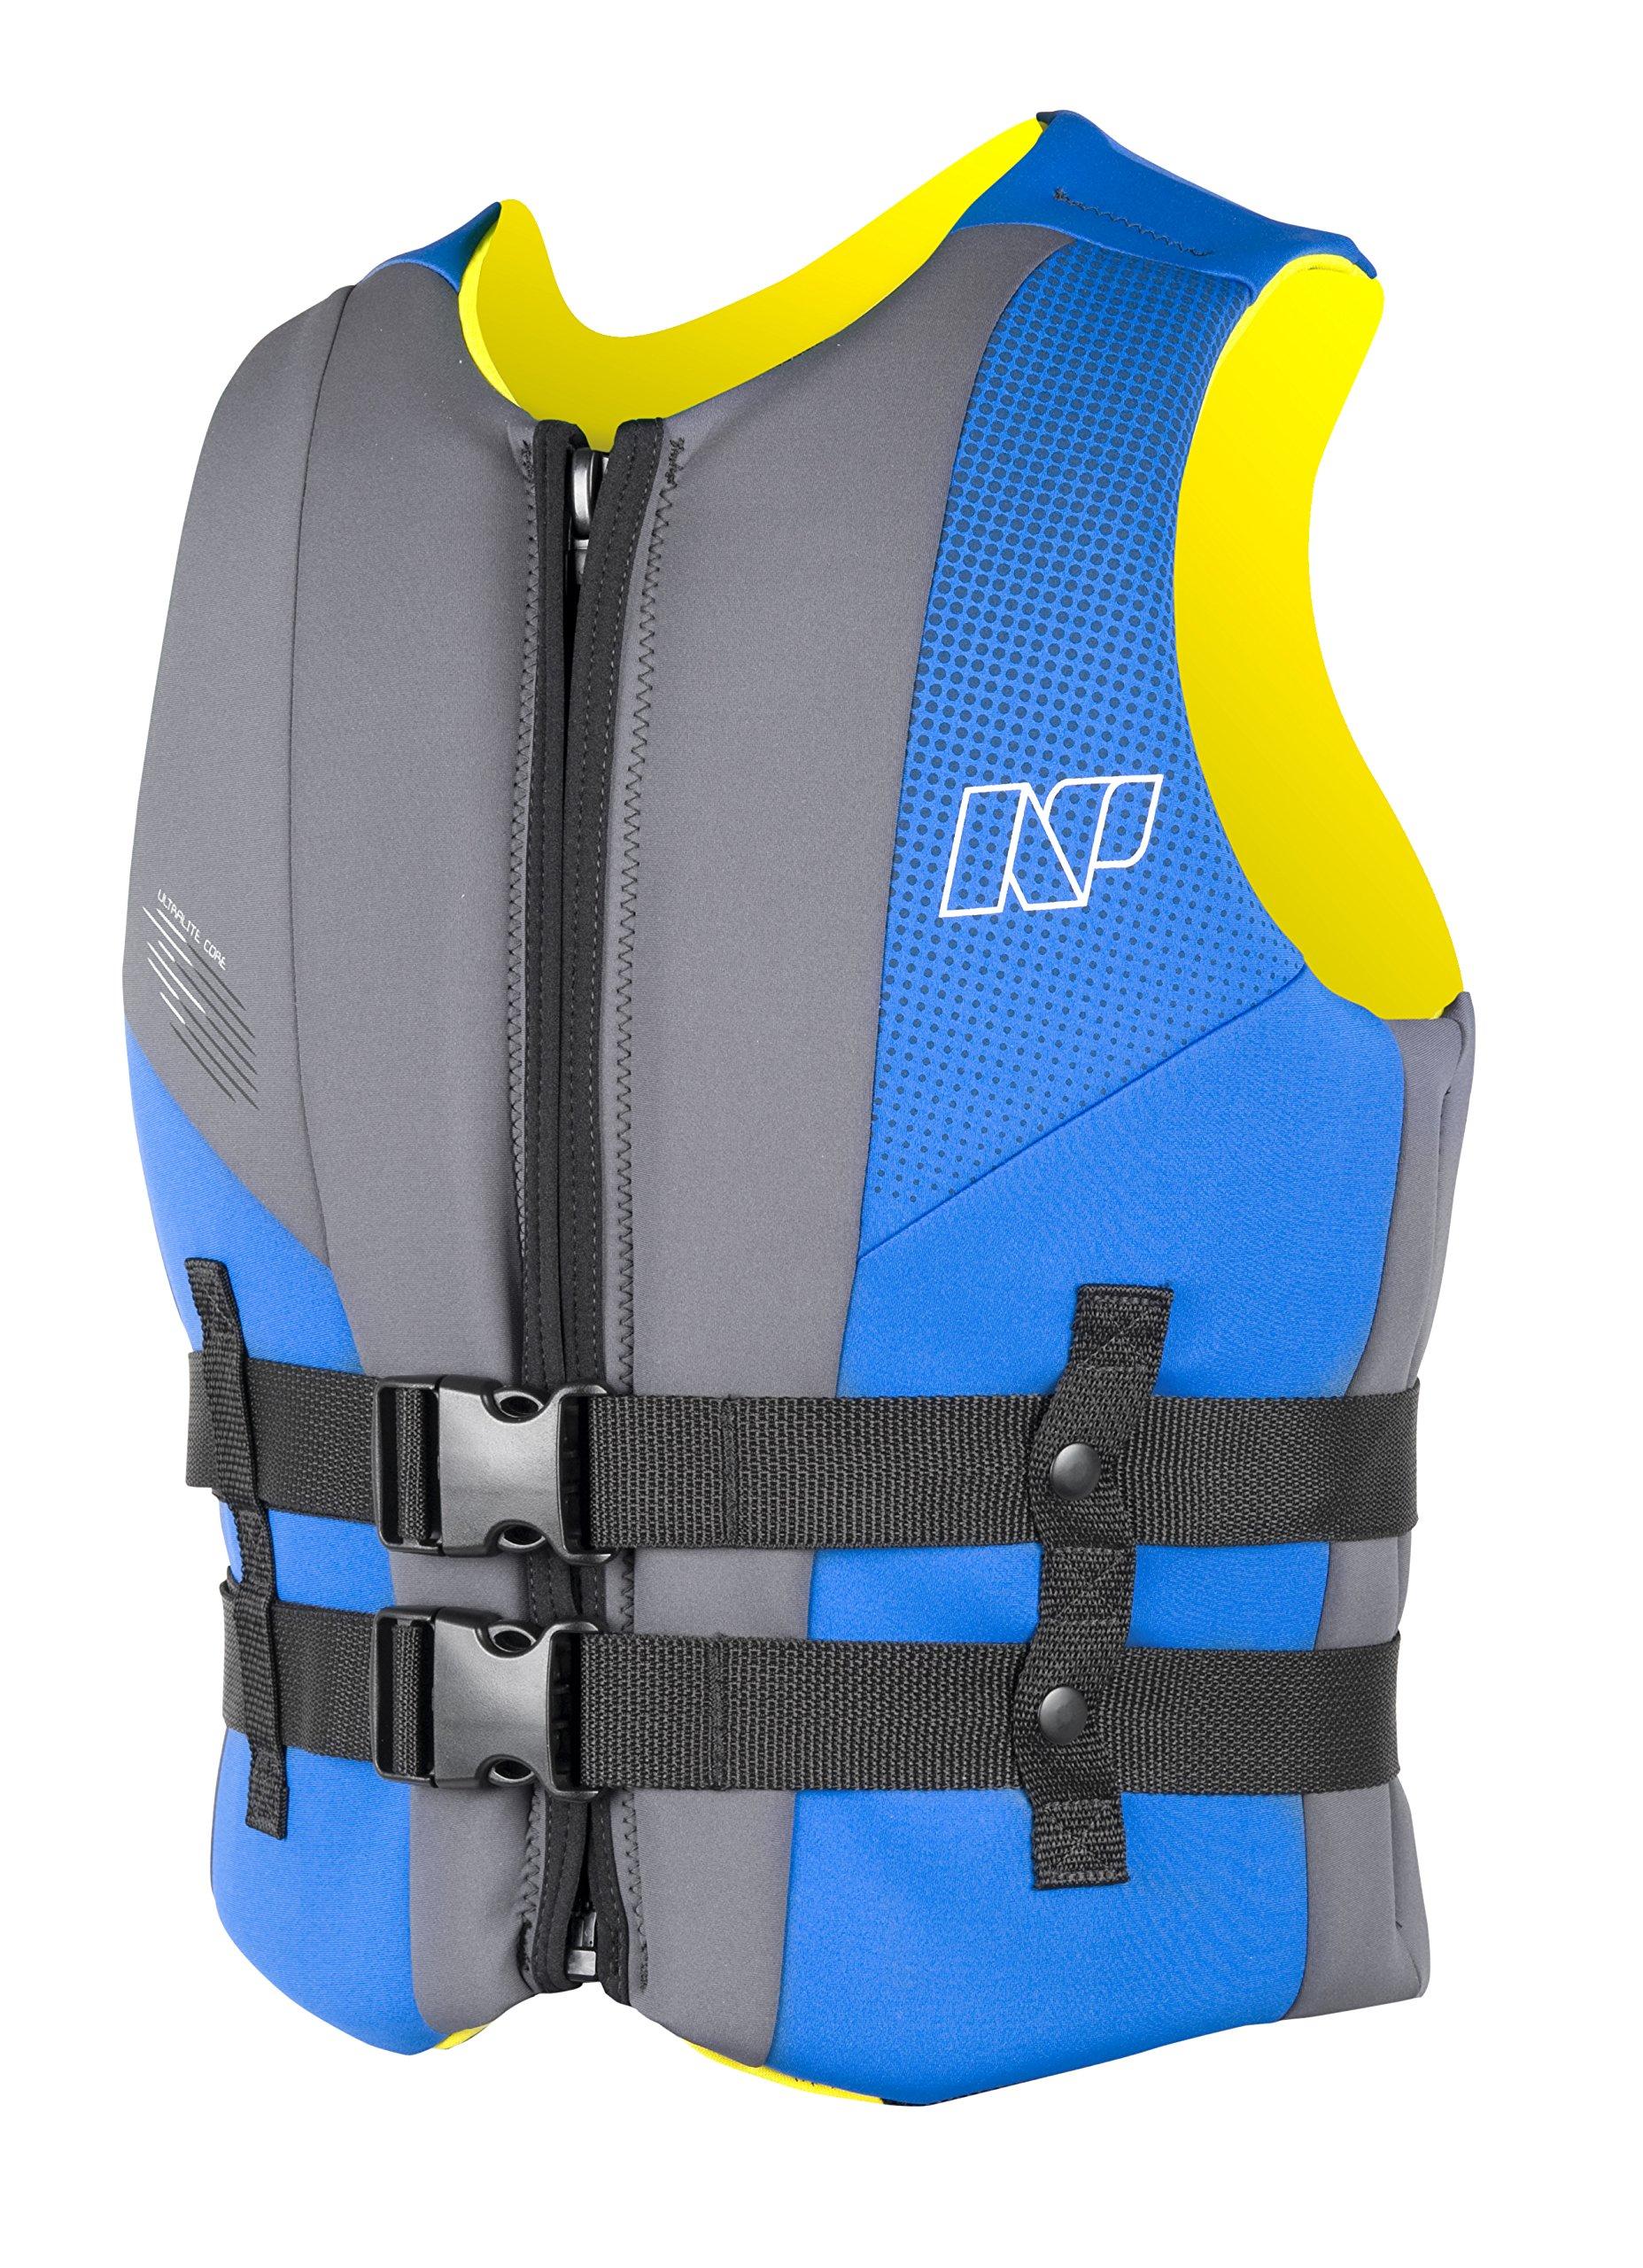 NP Surf USCG Neoprene Multi Sport Flotation Vest, Blue/Grey, Medium